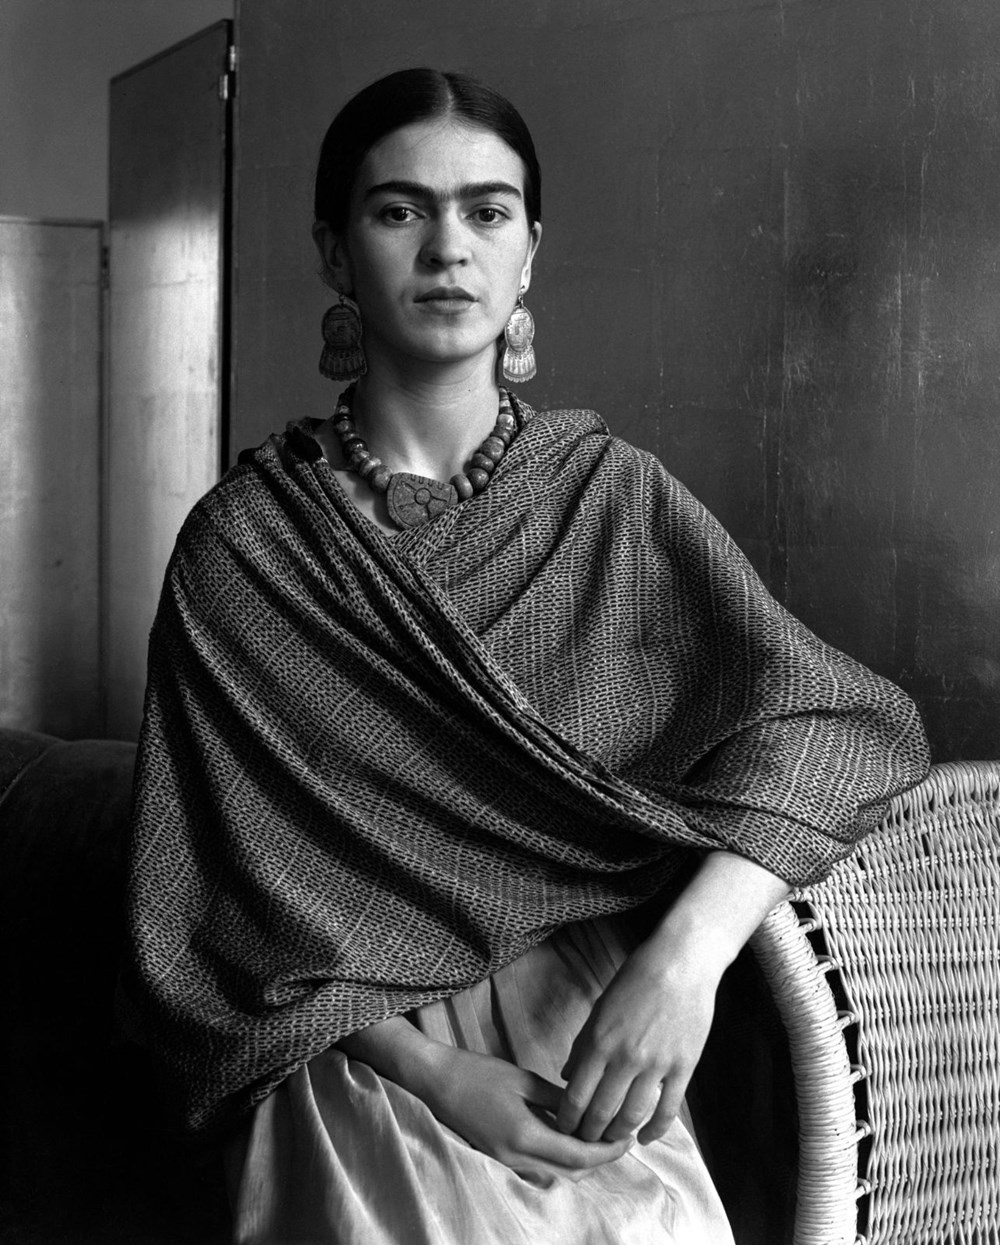 Frida Kahlo kimdir? (Tahta Bacak Frida Kahlo'nun hayatı) - 4